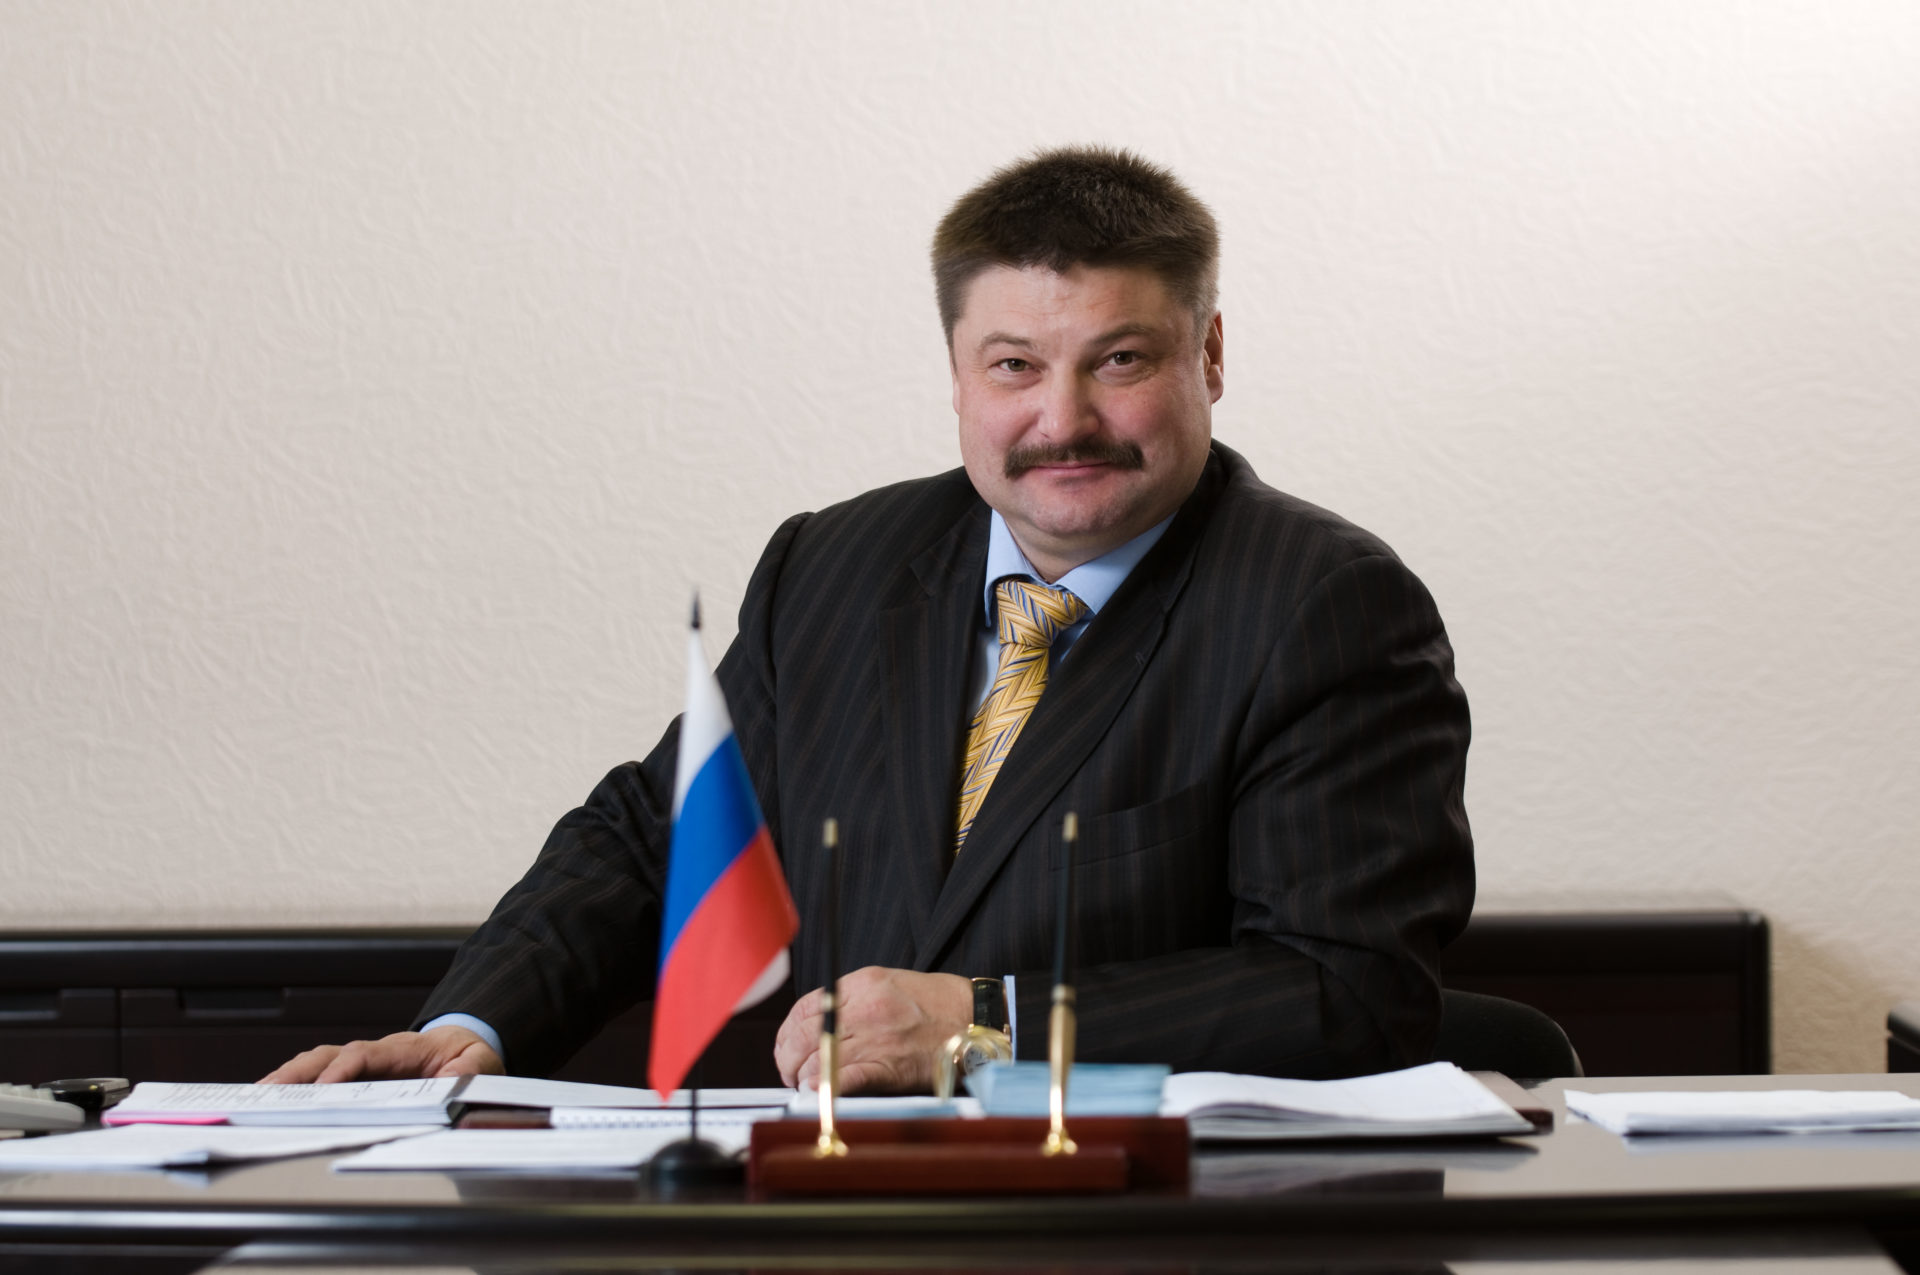 От имени коллектива АО « Акционерная компания «Железные дороги Якутии» поздравляю всех мужчин с Днём защитника Отечества!